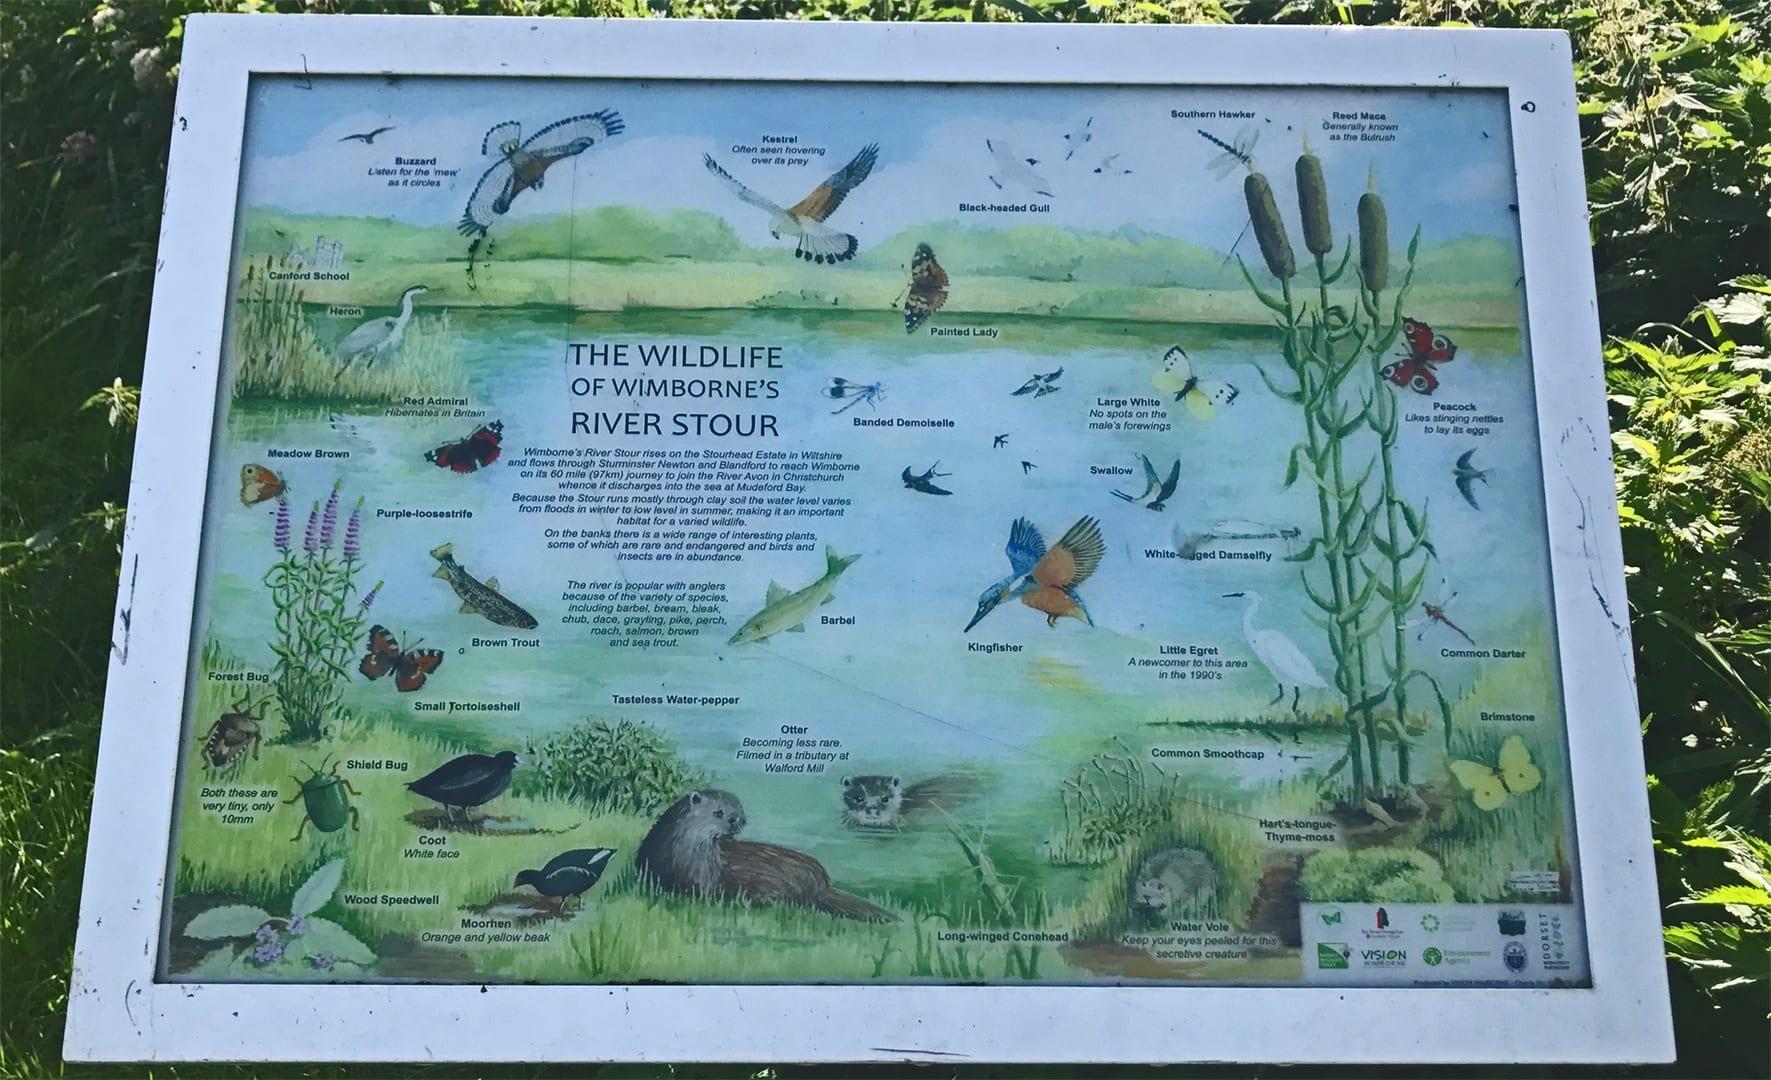 Wildlife on the River Stour